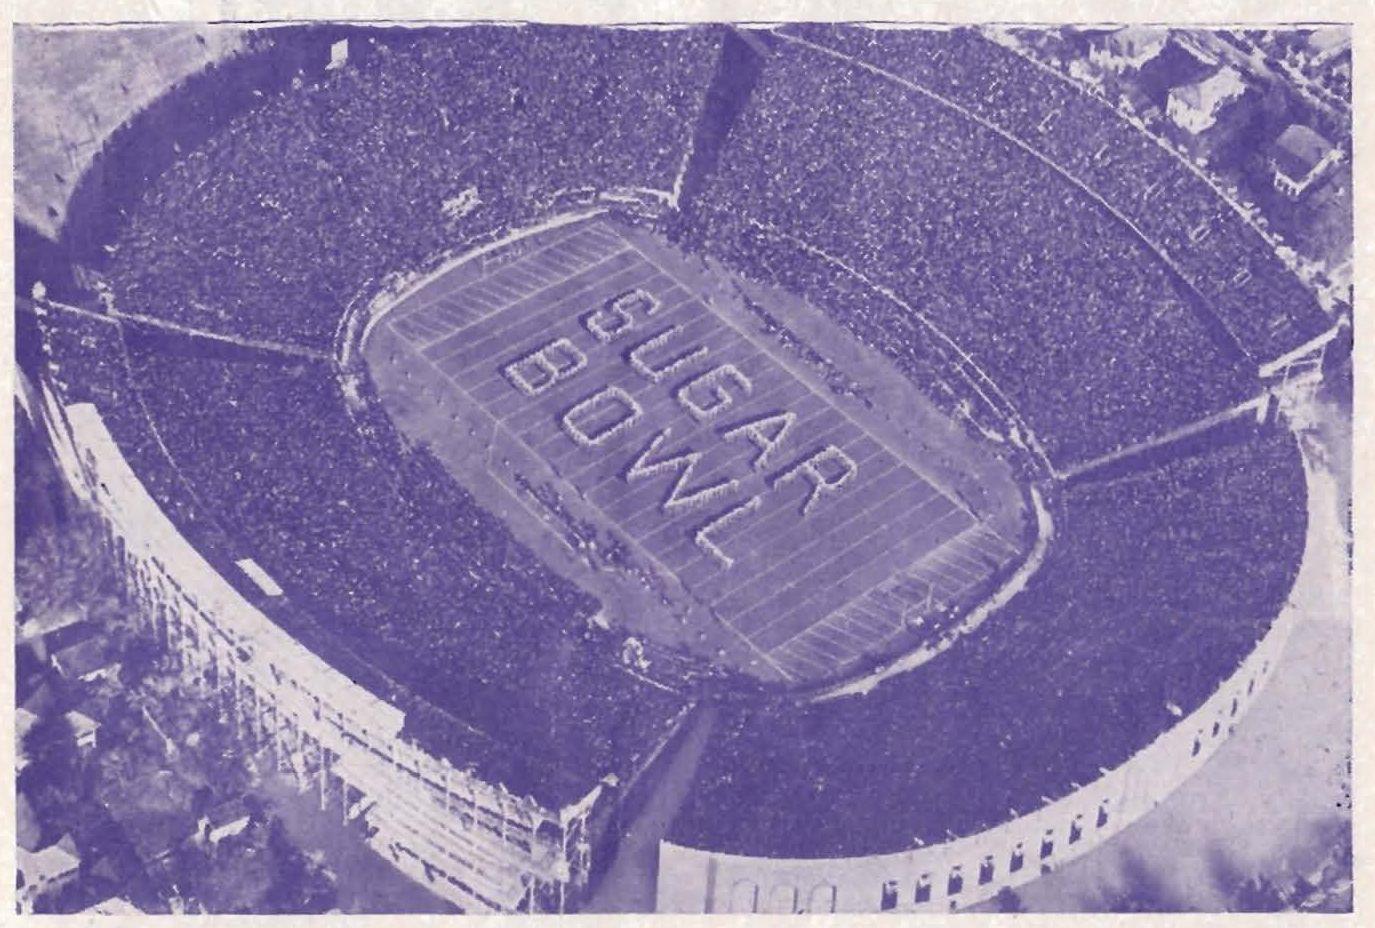 Tulane_Stadium_Sugar_Bowl_This_Week_in_New_Orleans_Dec_4_1948.jpg 1375×928 pikseli